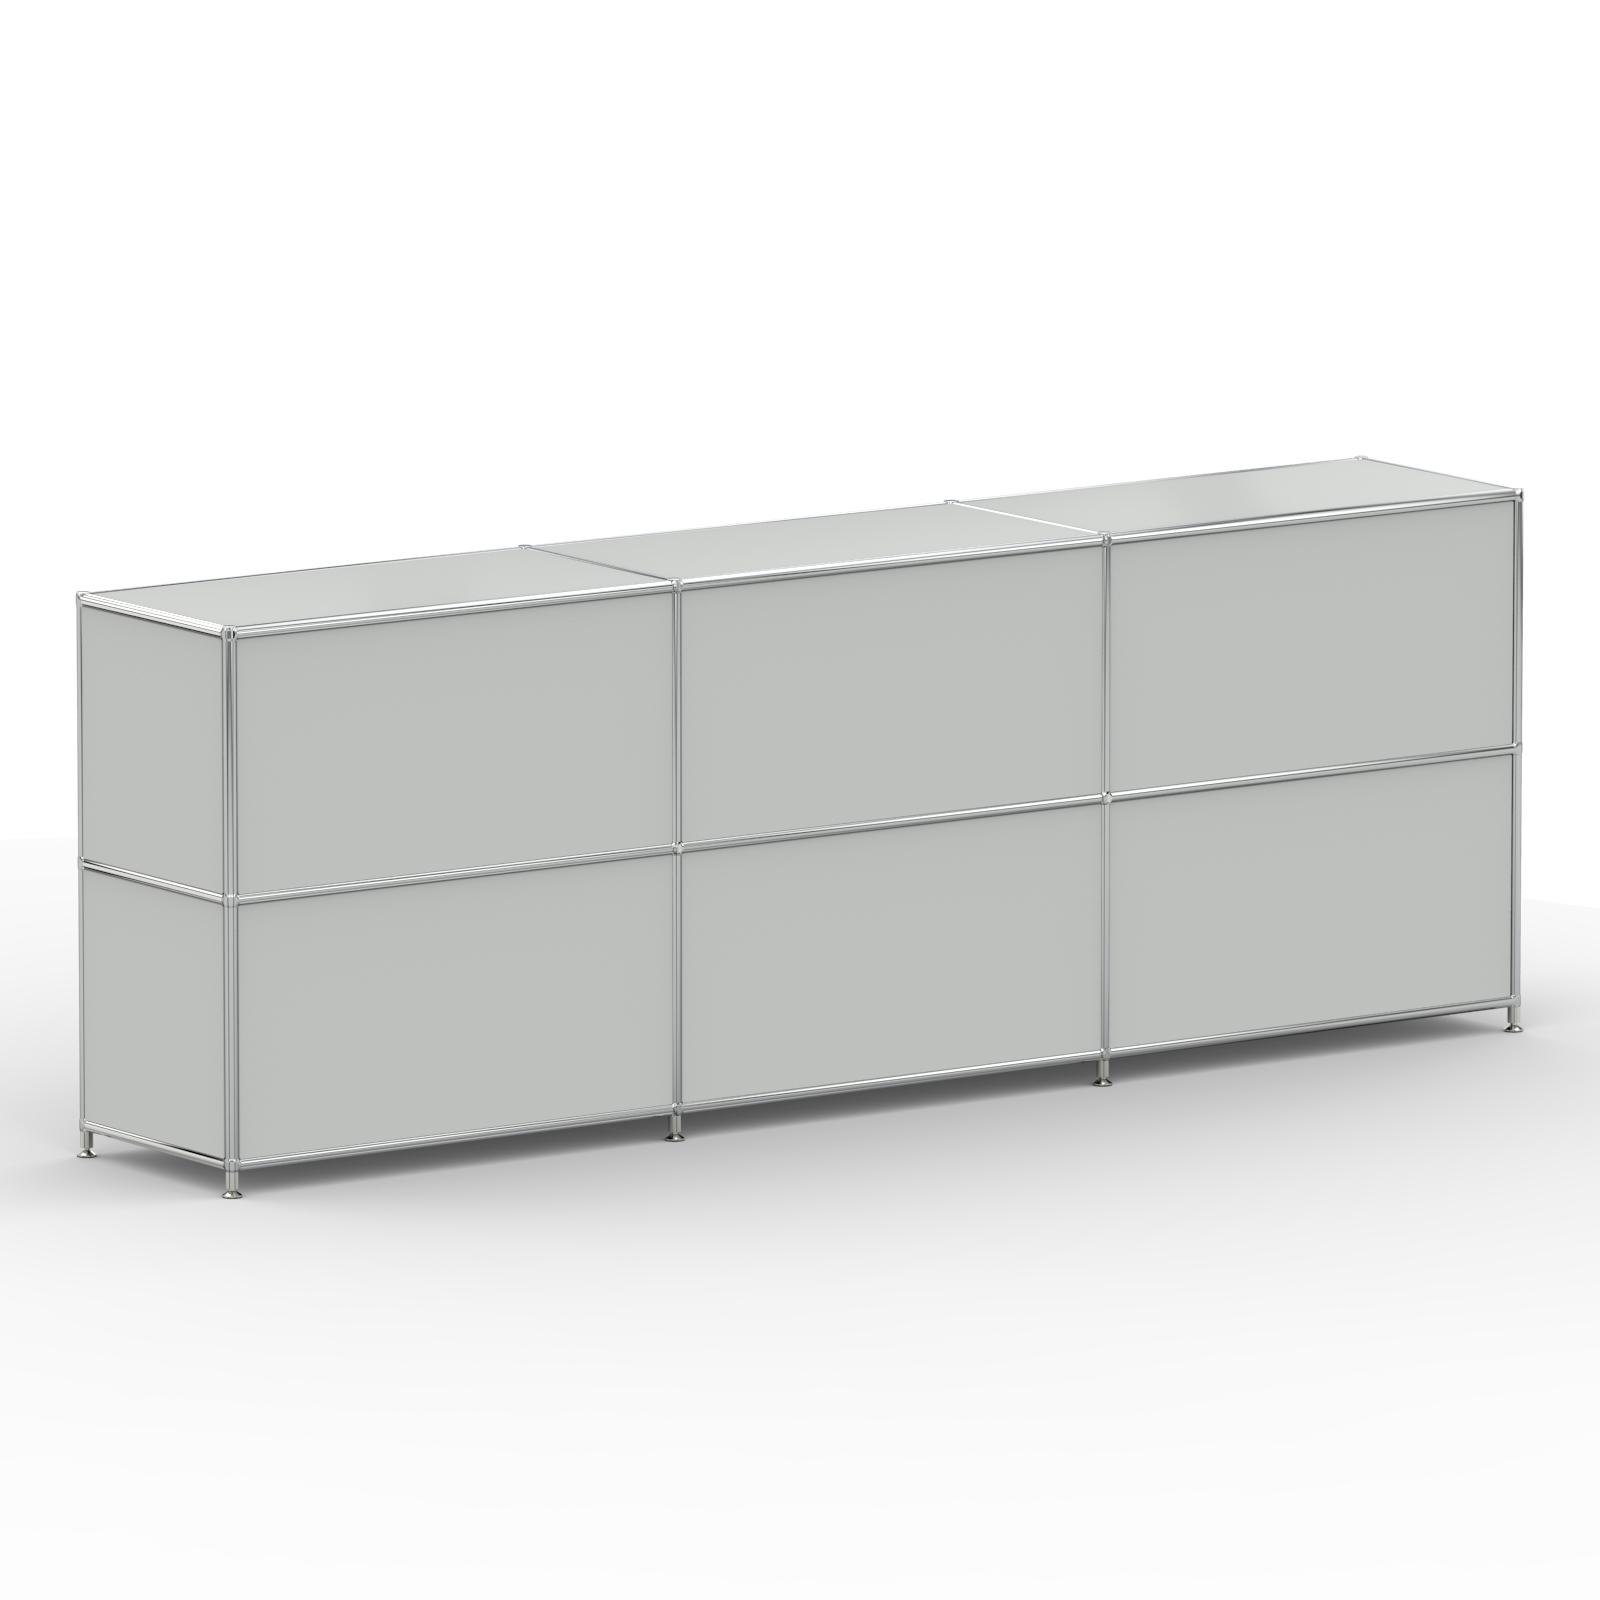 Sideboard 6xschublade Metall Grau Kaufen Versee